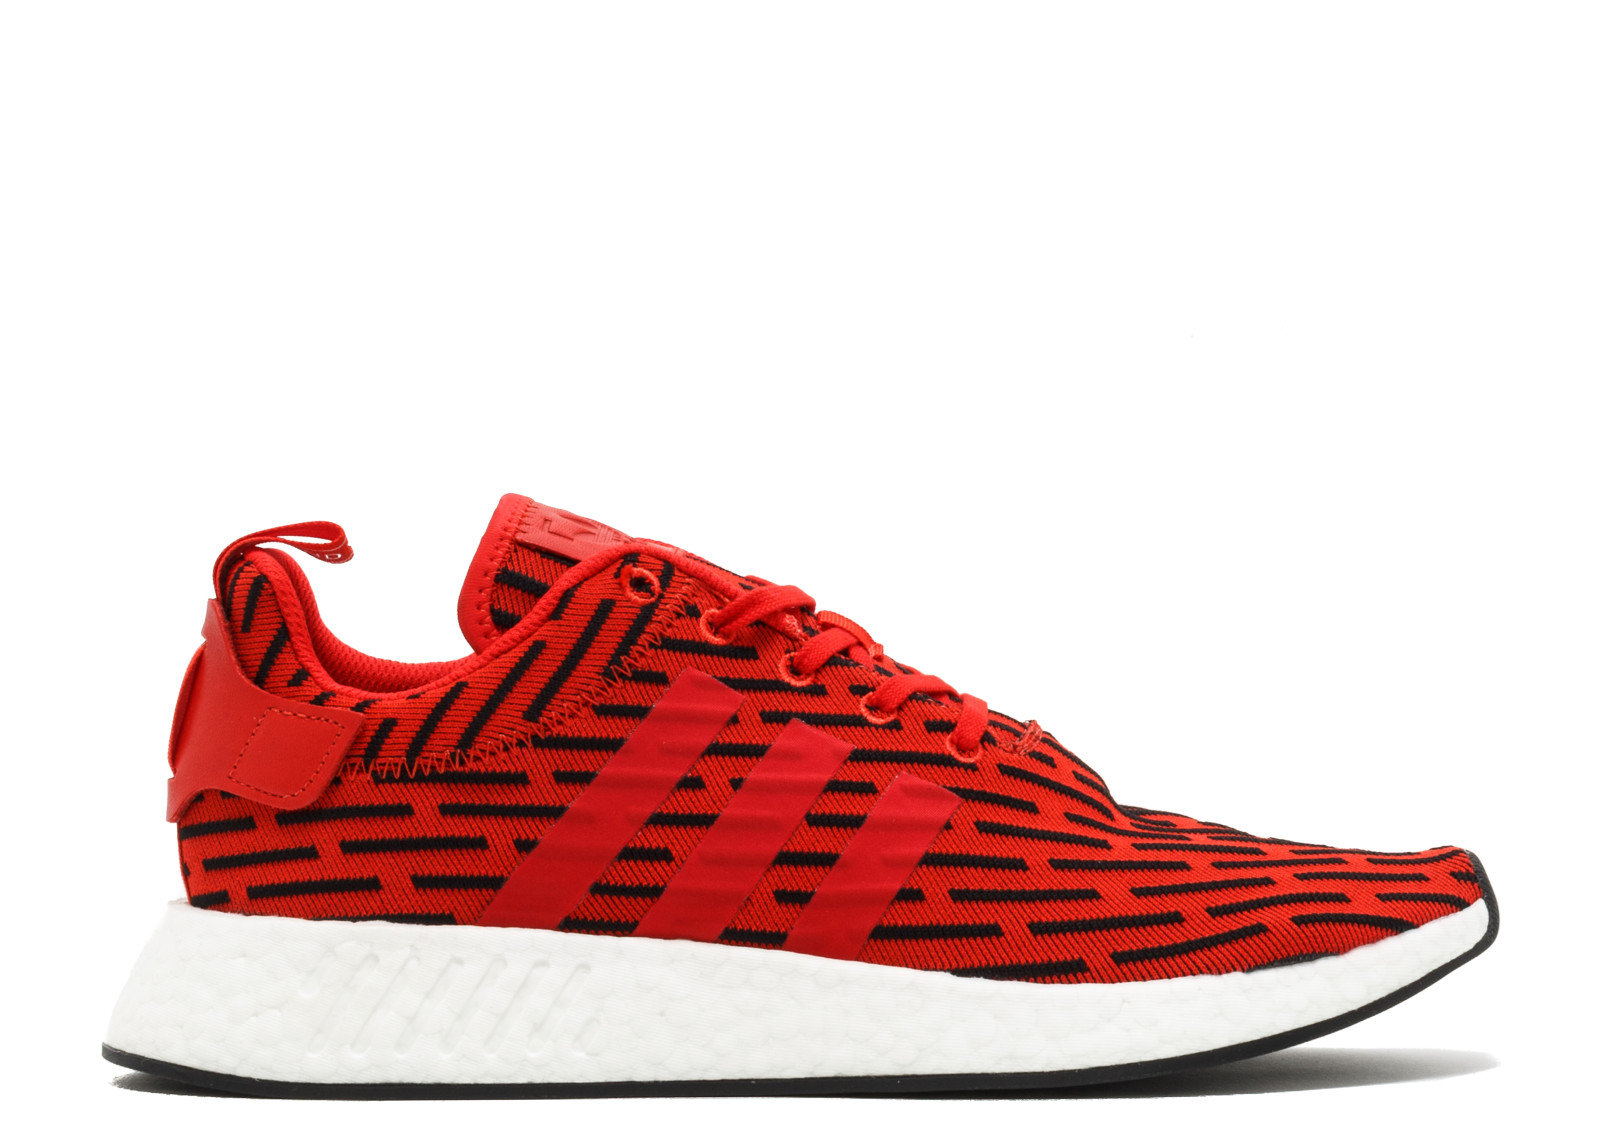 best sneakers 9d56d 5e42d Adidas NMD R2 Primeknit